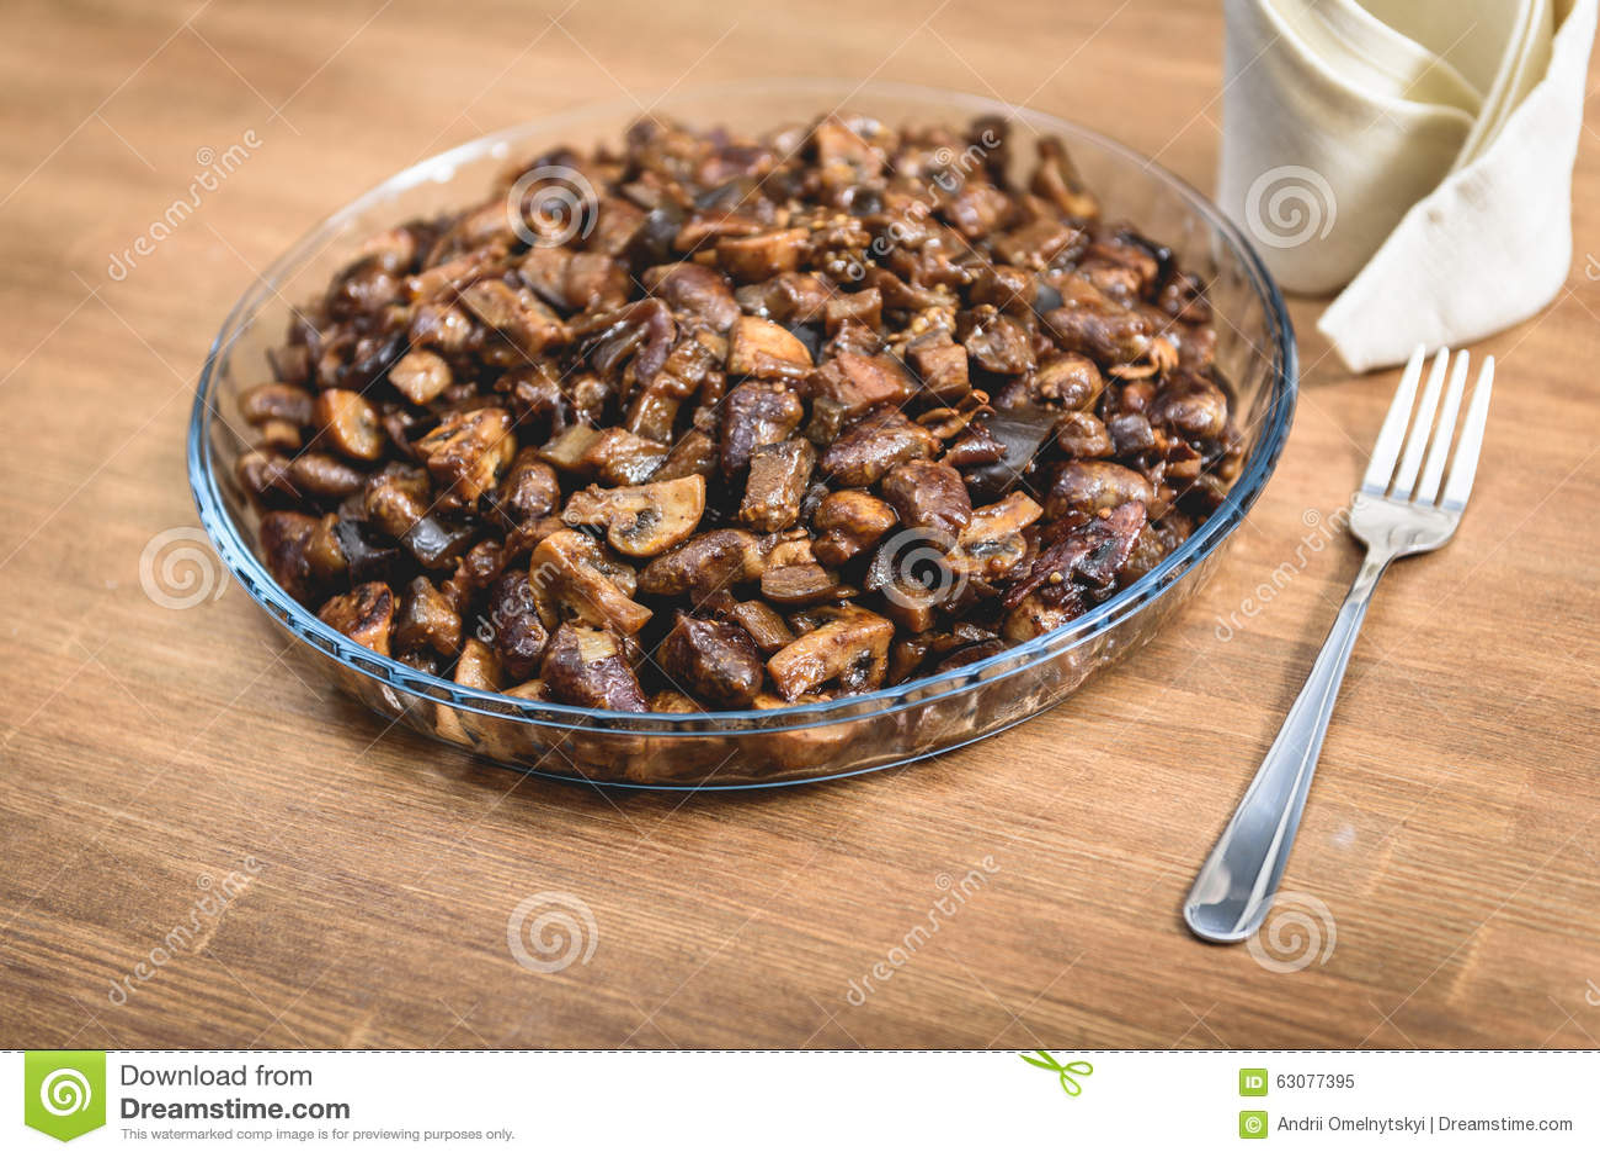 Download Ragoût végétal chaud image stock. Image du fond, vapeur - 63077395